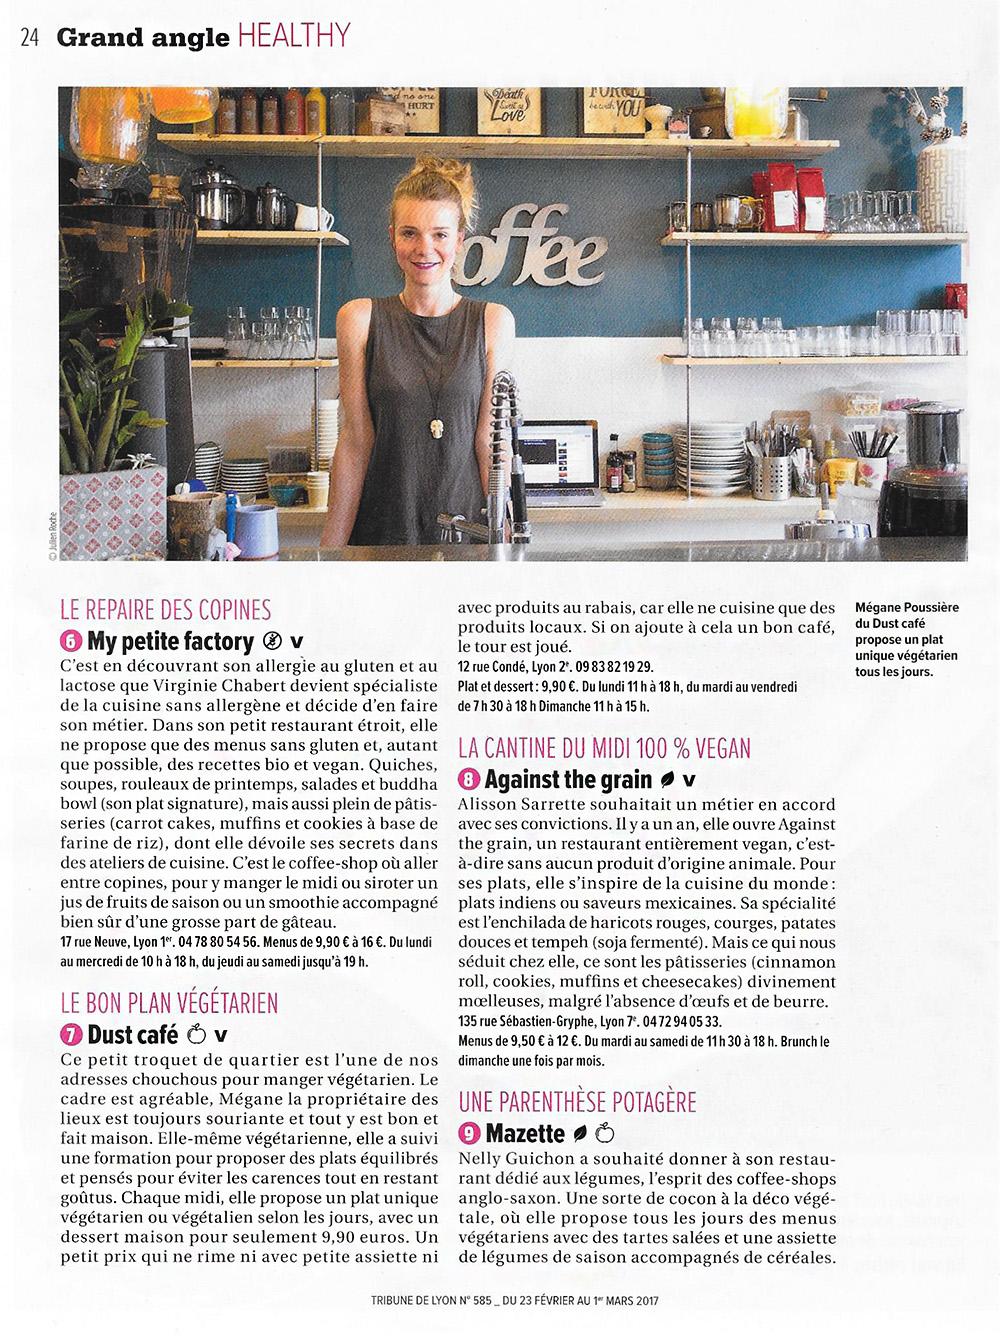 Paru-Tribune-de-Lyon-fev-2017